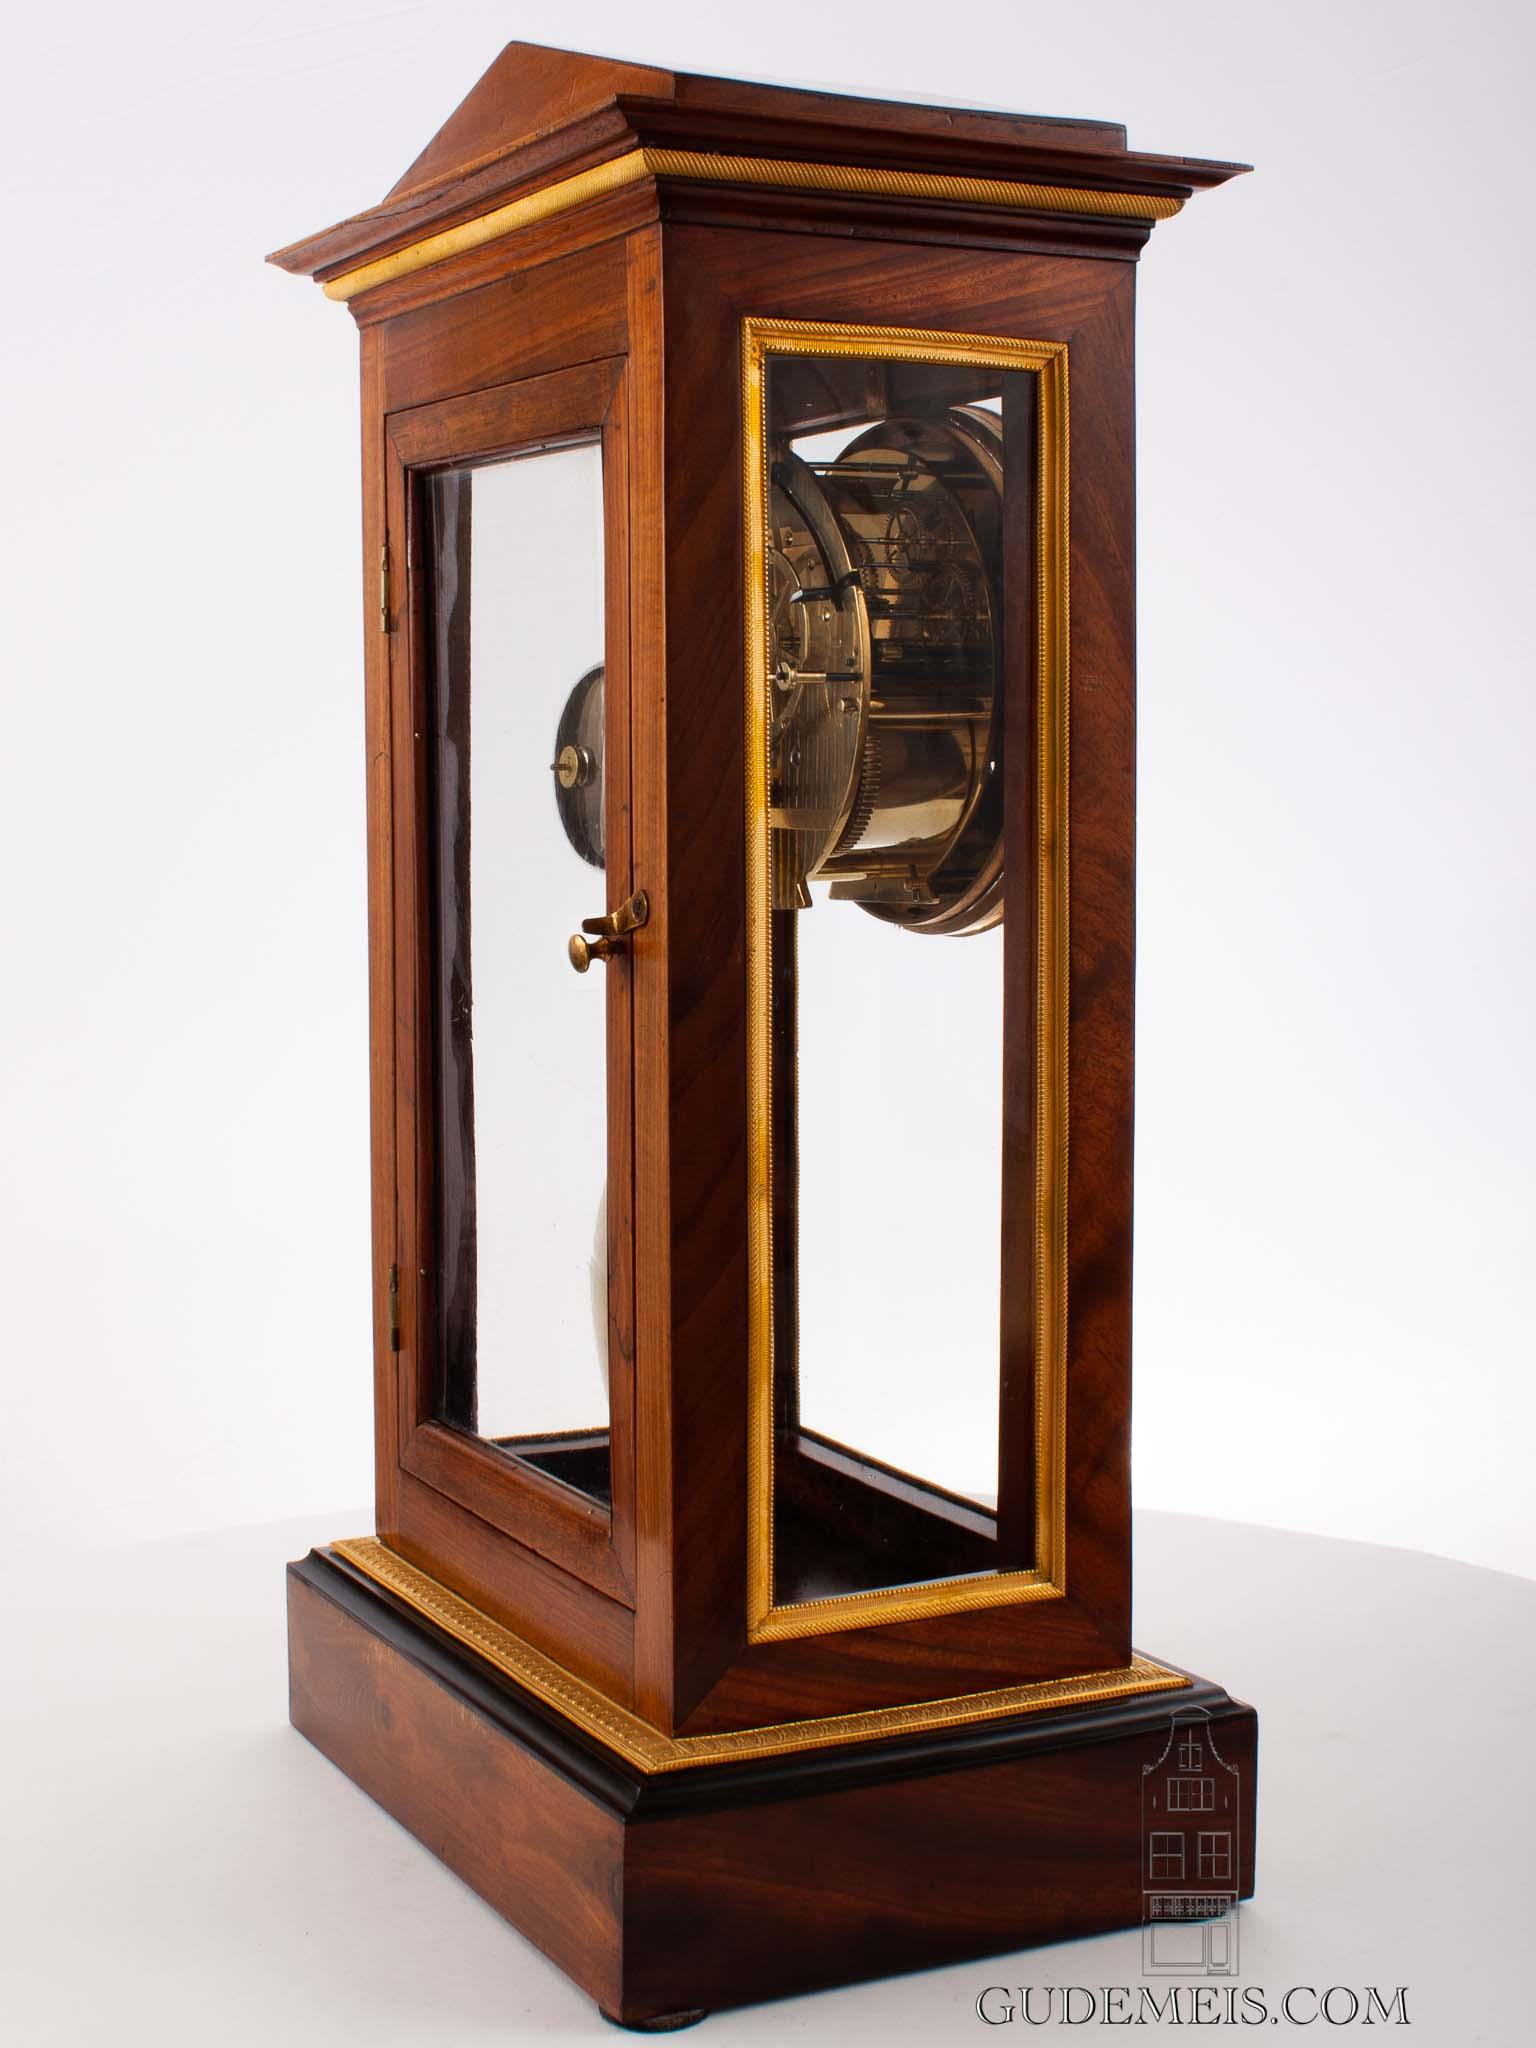 French-Empire-ormolu-gilt-bronze-mahogany-architectural-precision-table-regulator-antique-clock